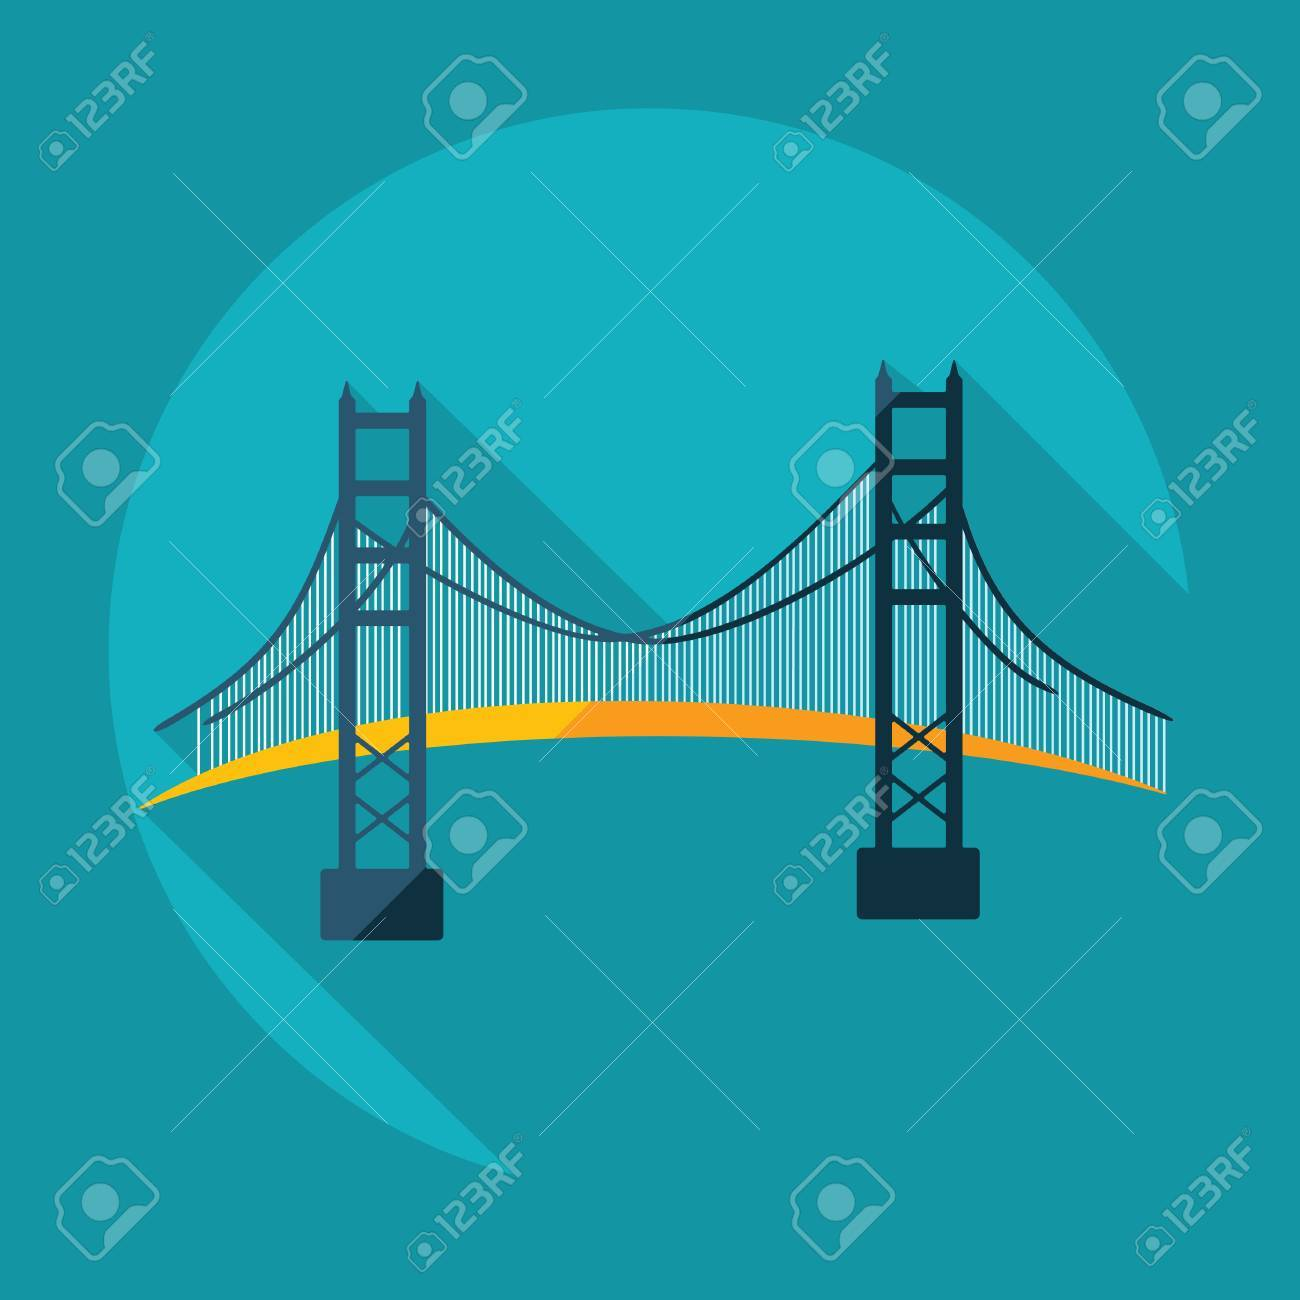 Flat modern design with shadow San Francisco Golden Gate bridge - 53032341